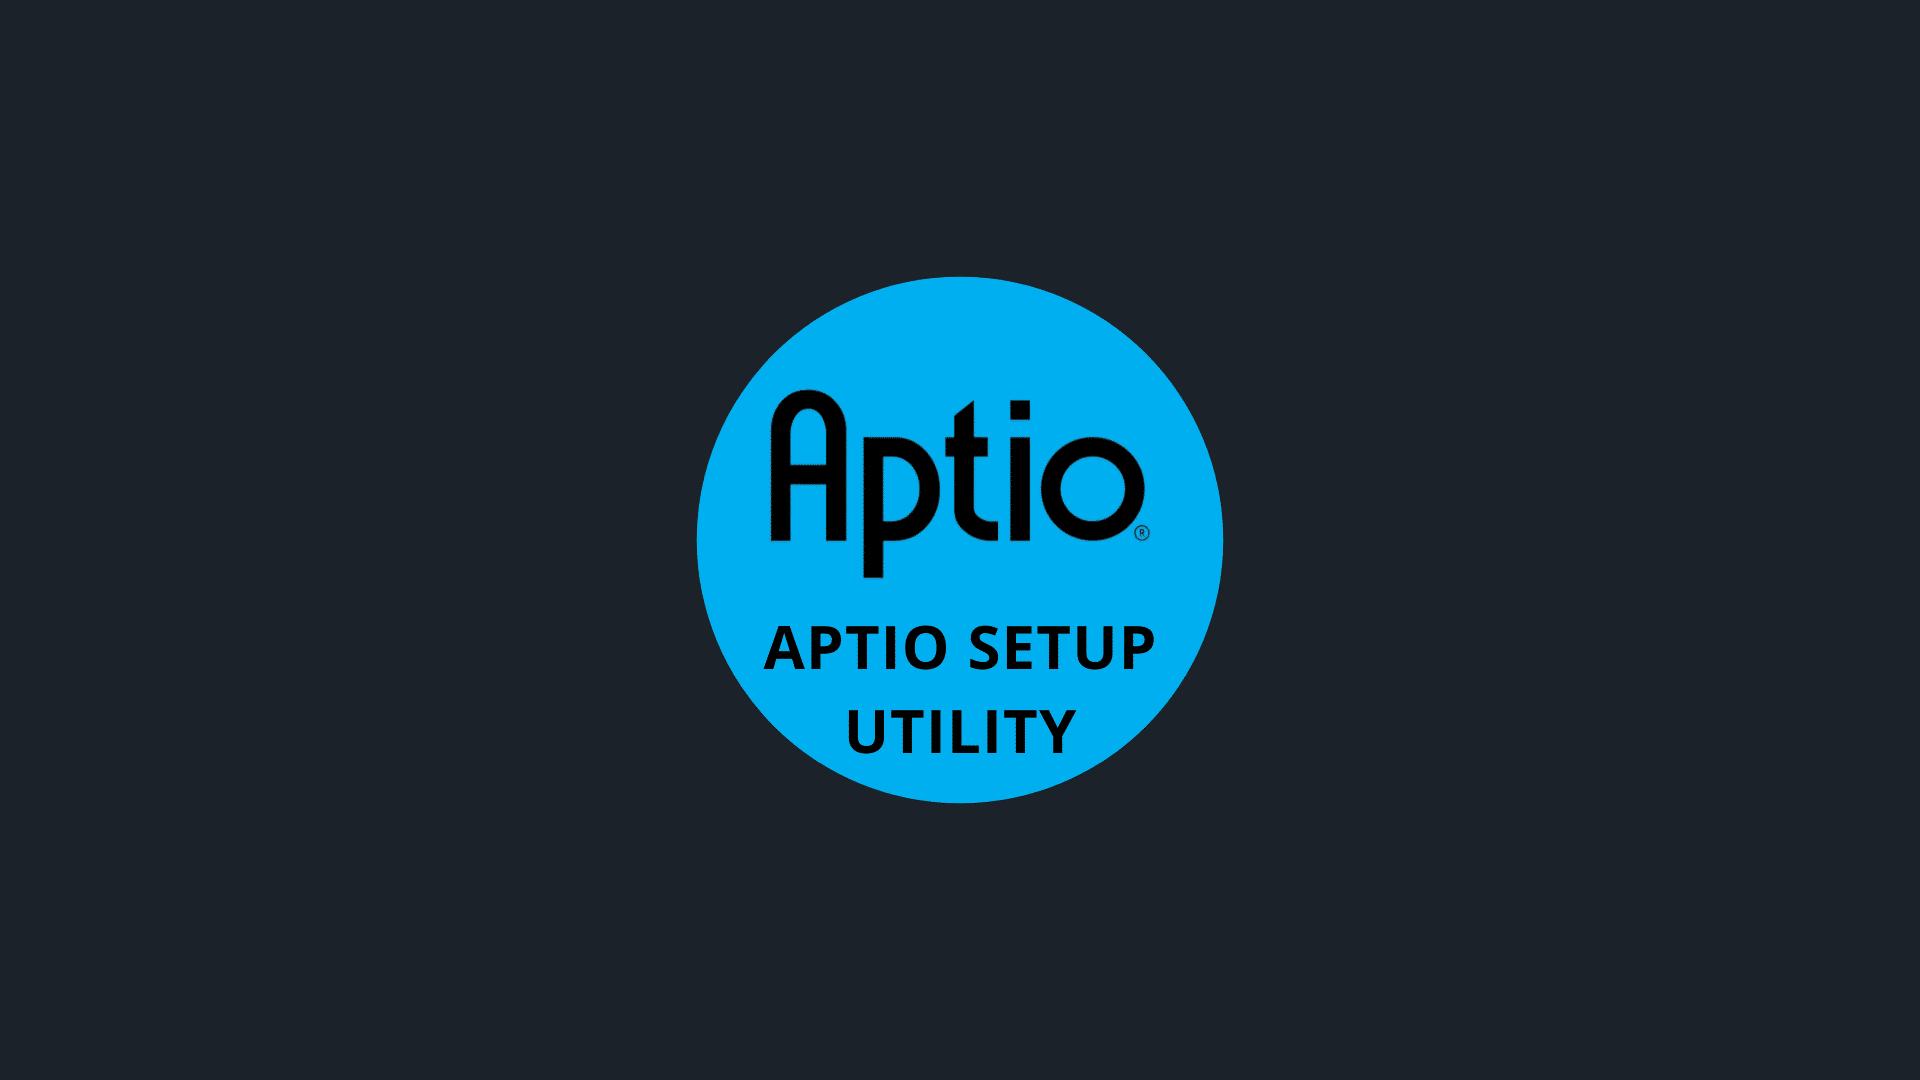 Aptio Setup Utility